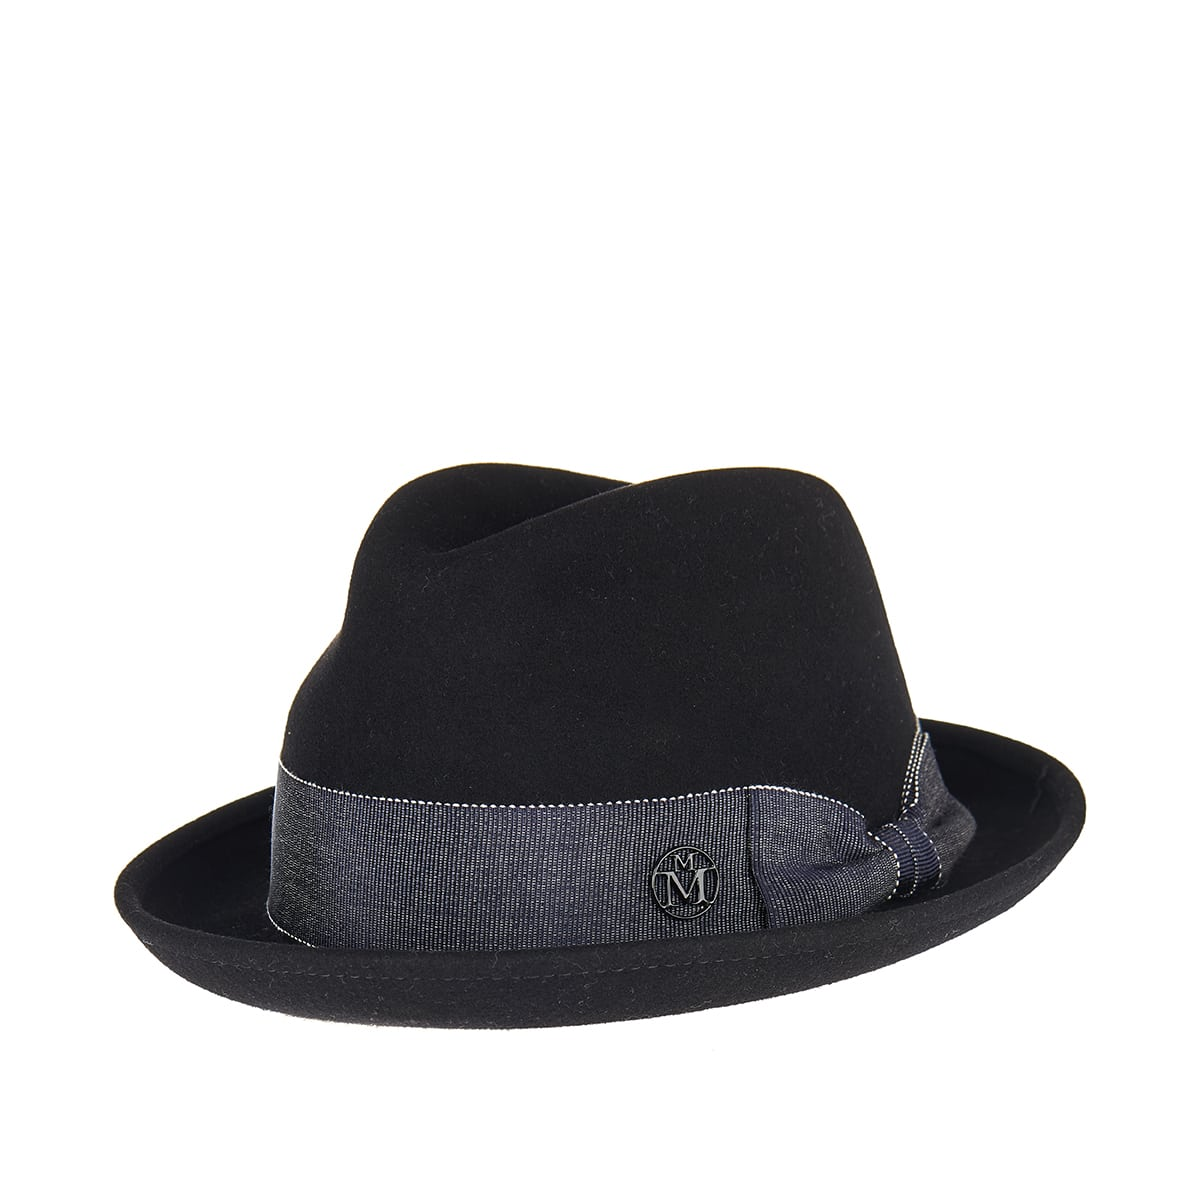 Ygor felt hat